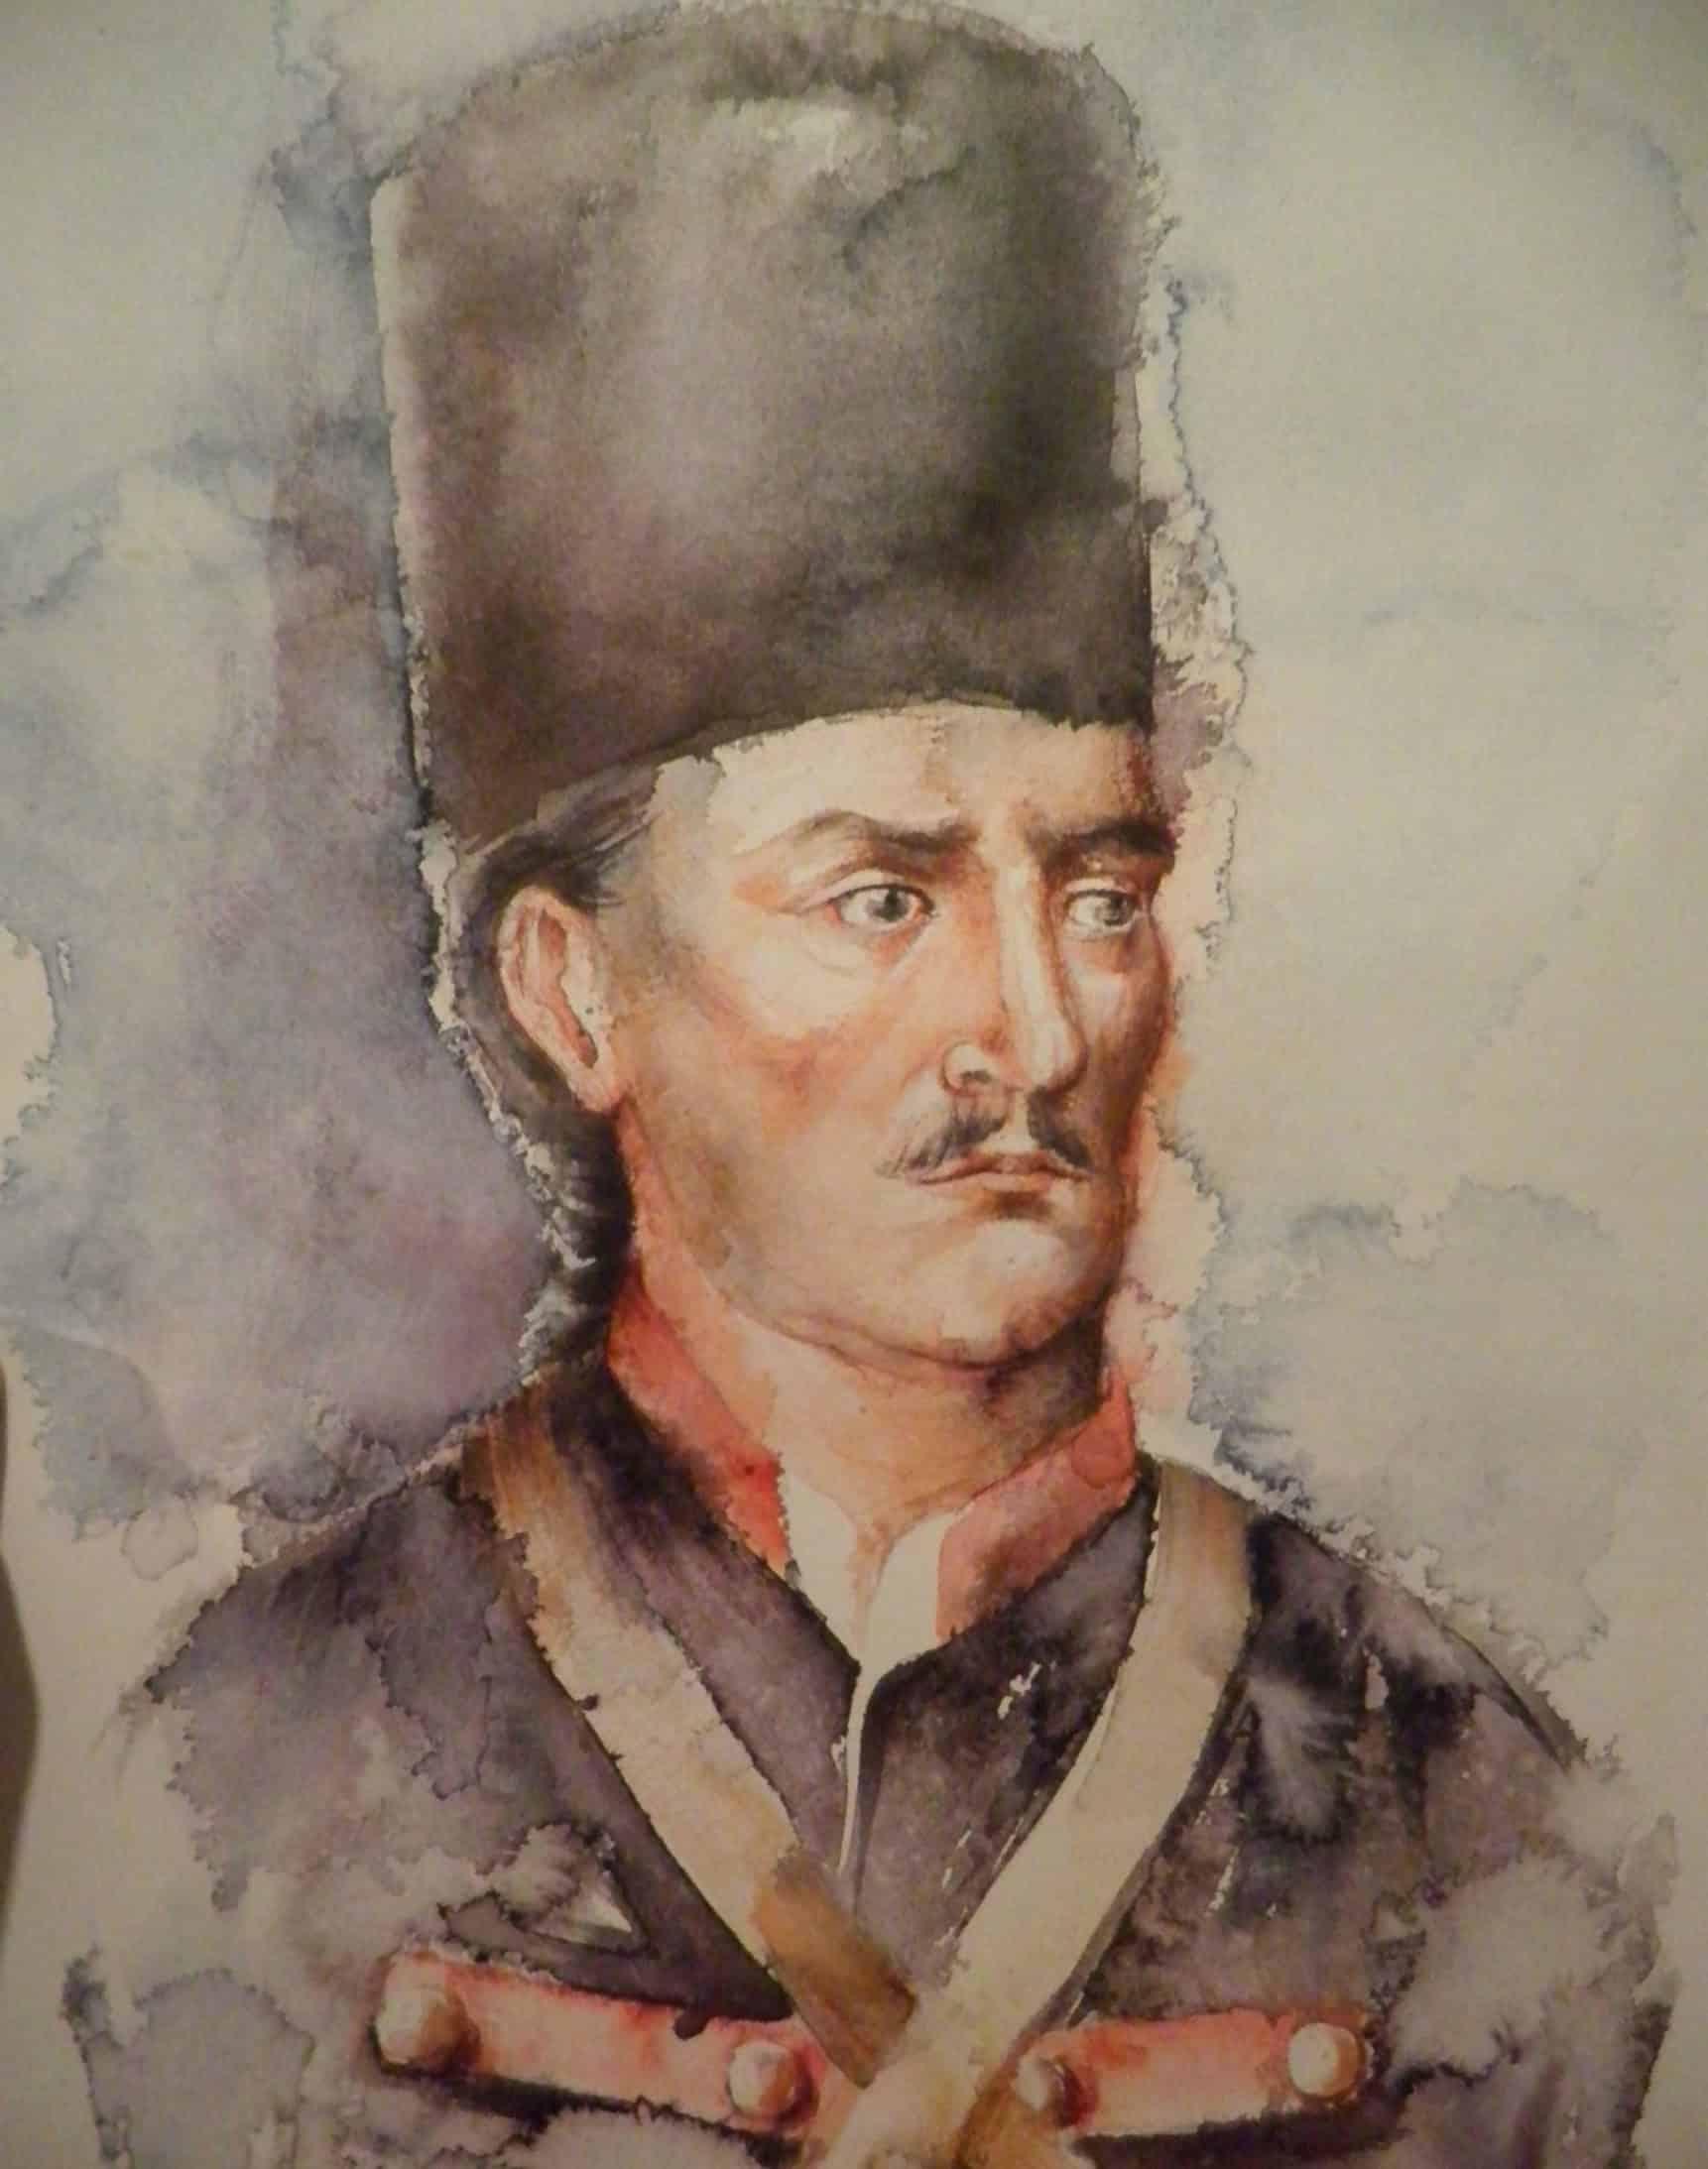 Boban Veljković - Portret Đorđa Petrovića KArađorđa kao frajkora